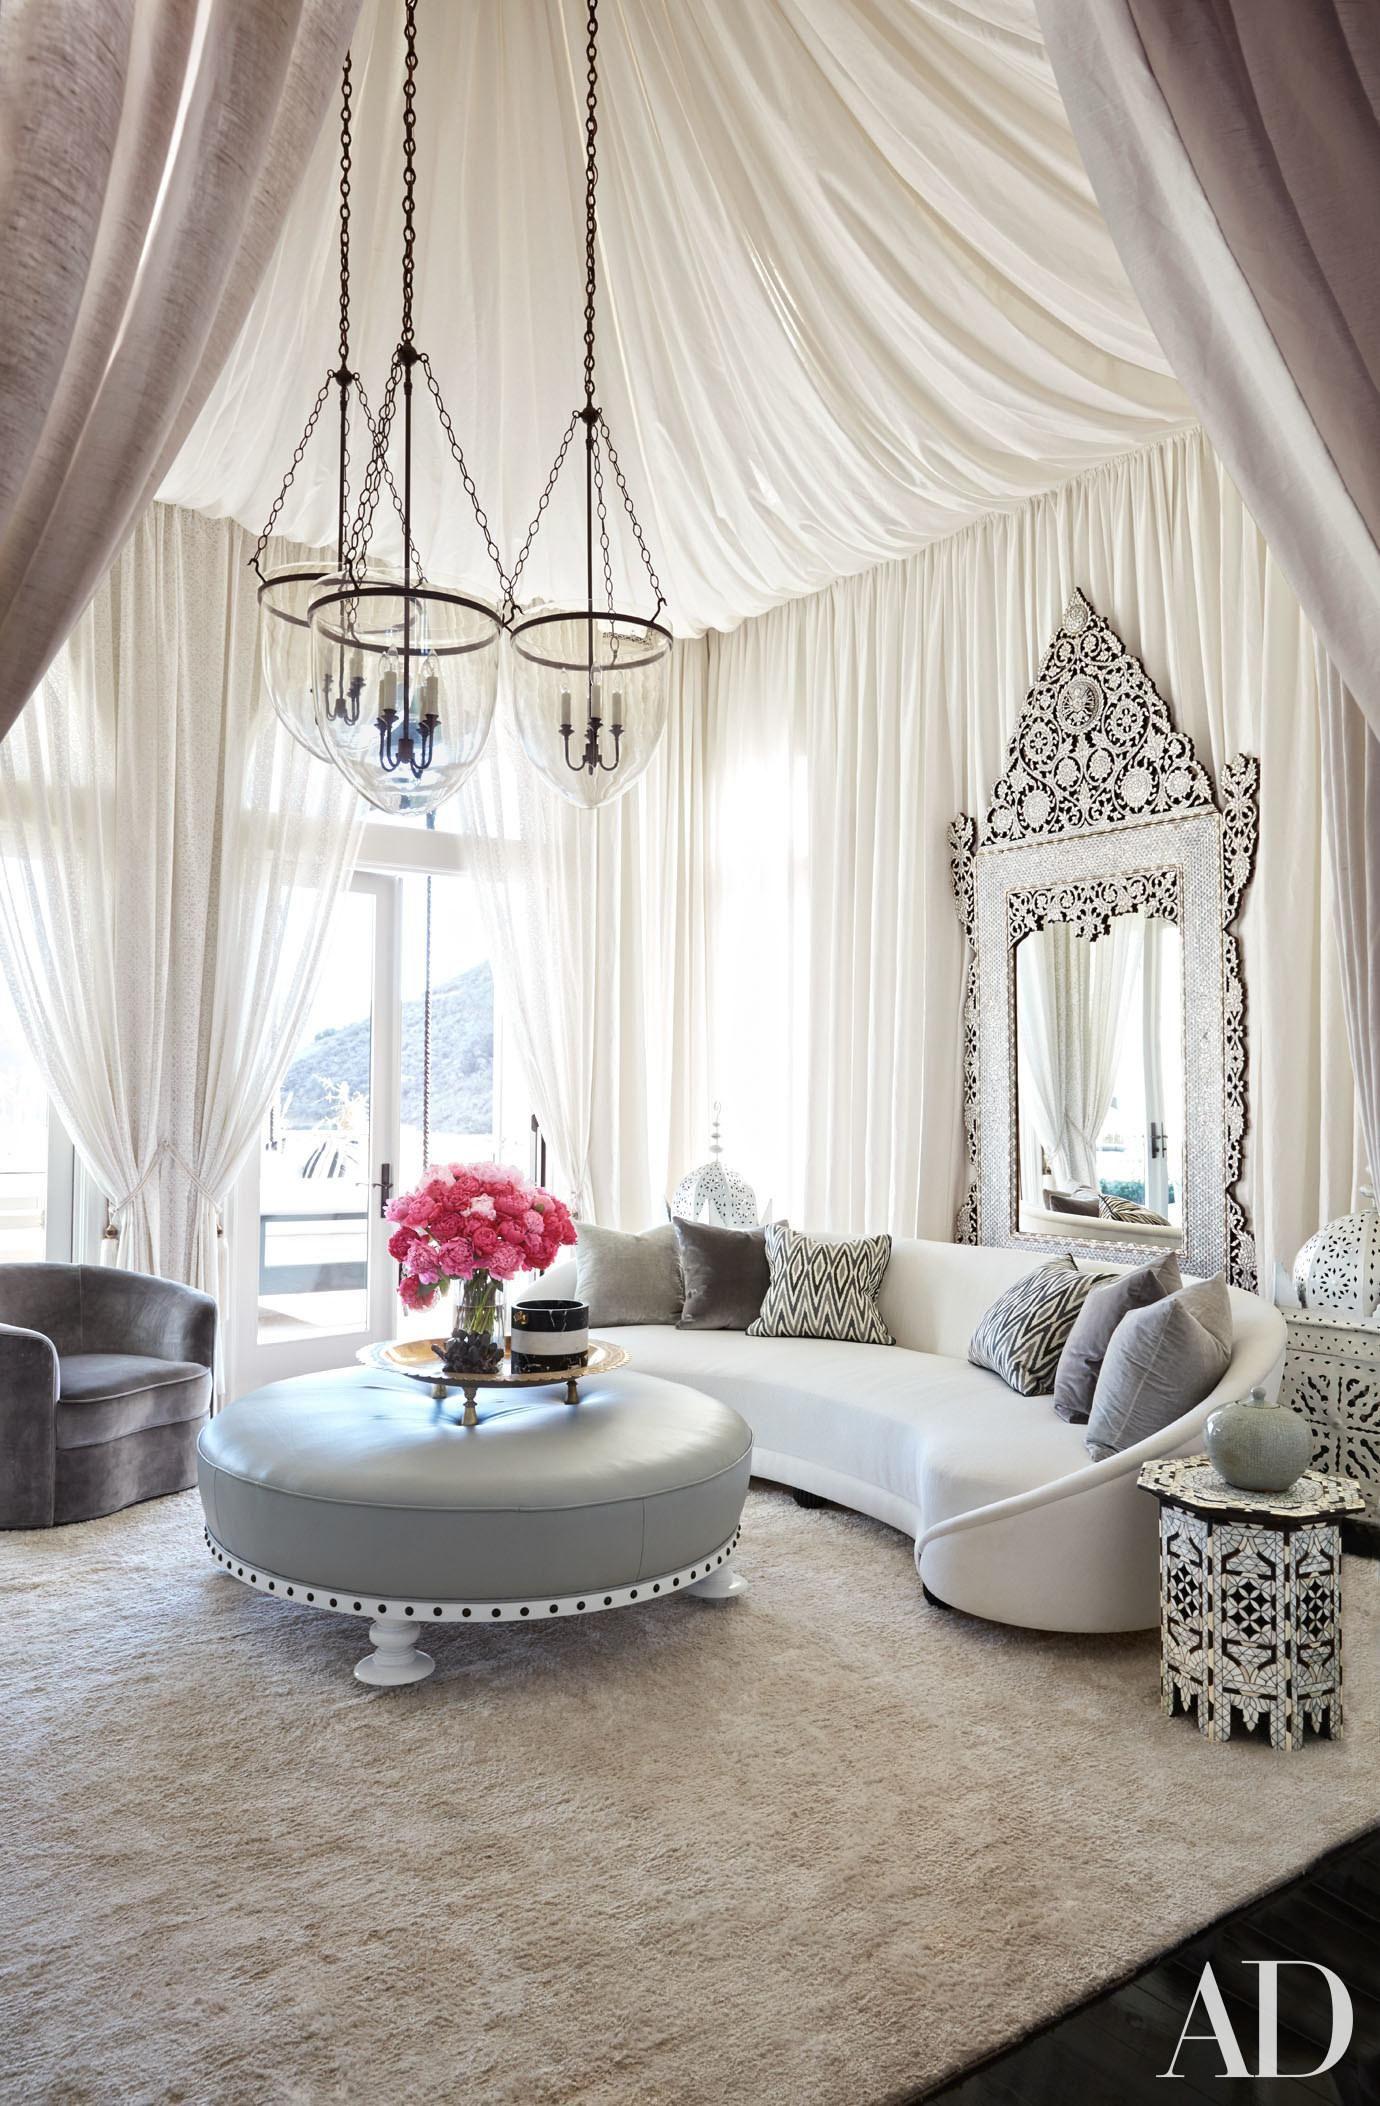 10 Design Ideas We Love from Kourtney and Khloé Kardashians Calabasas Homes